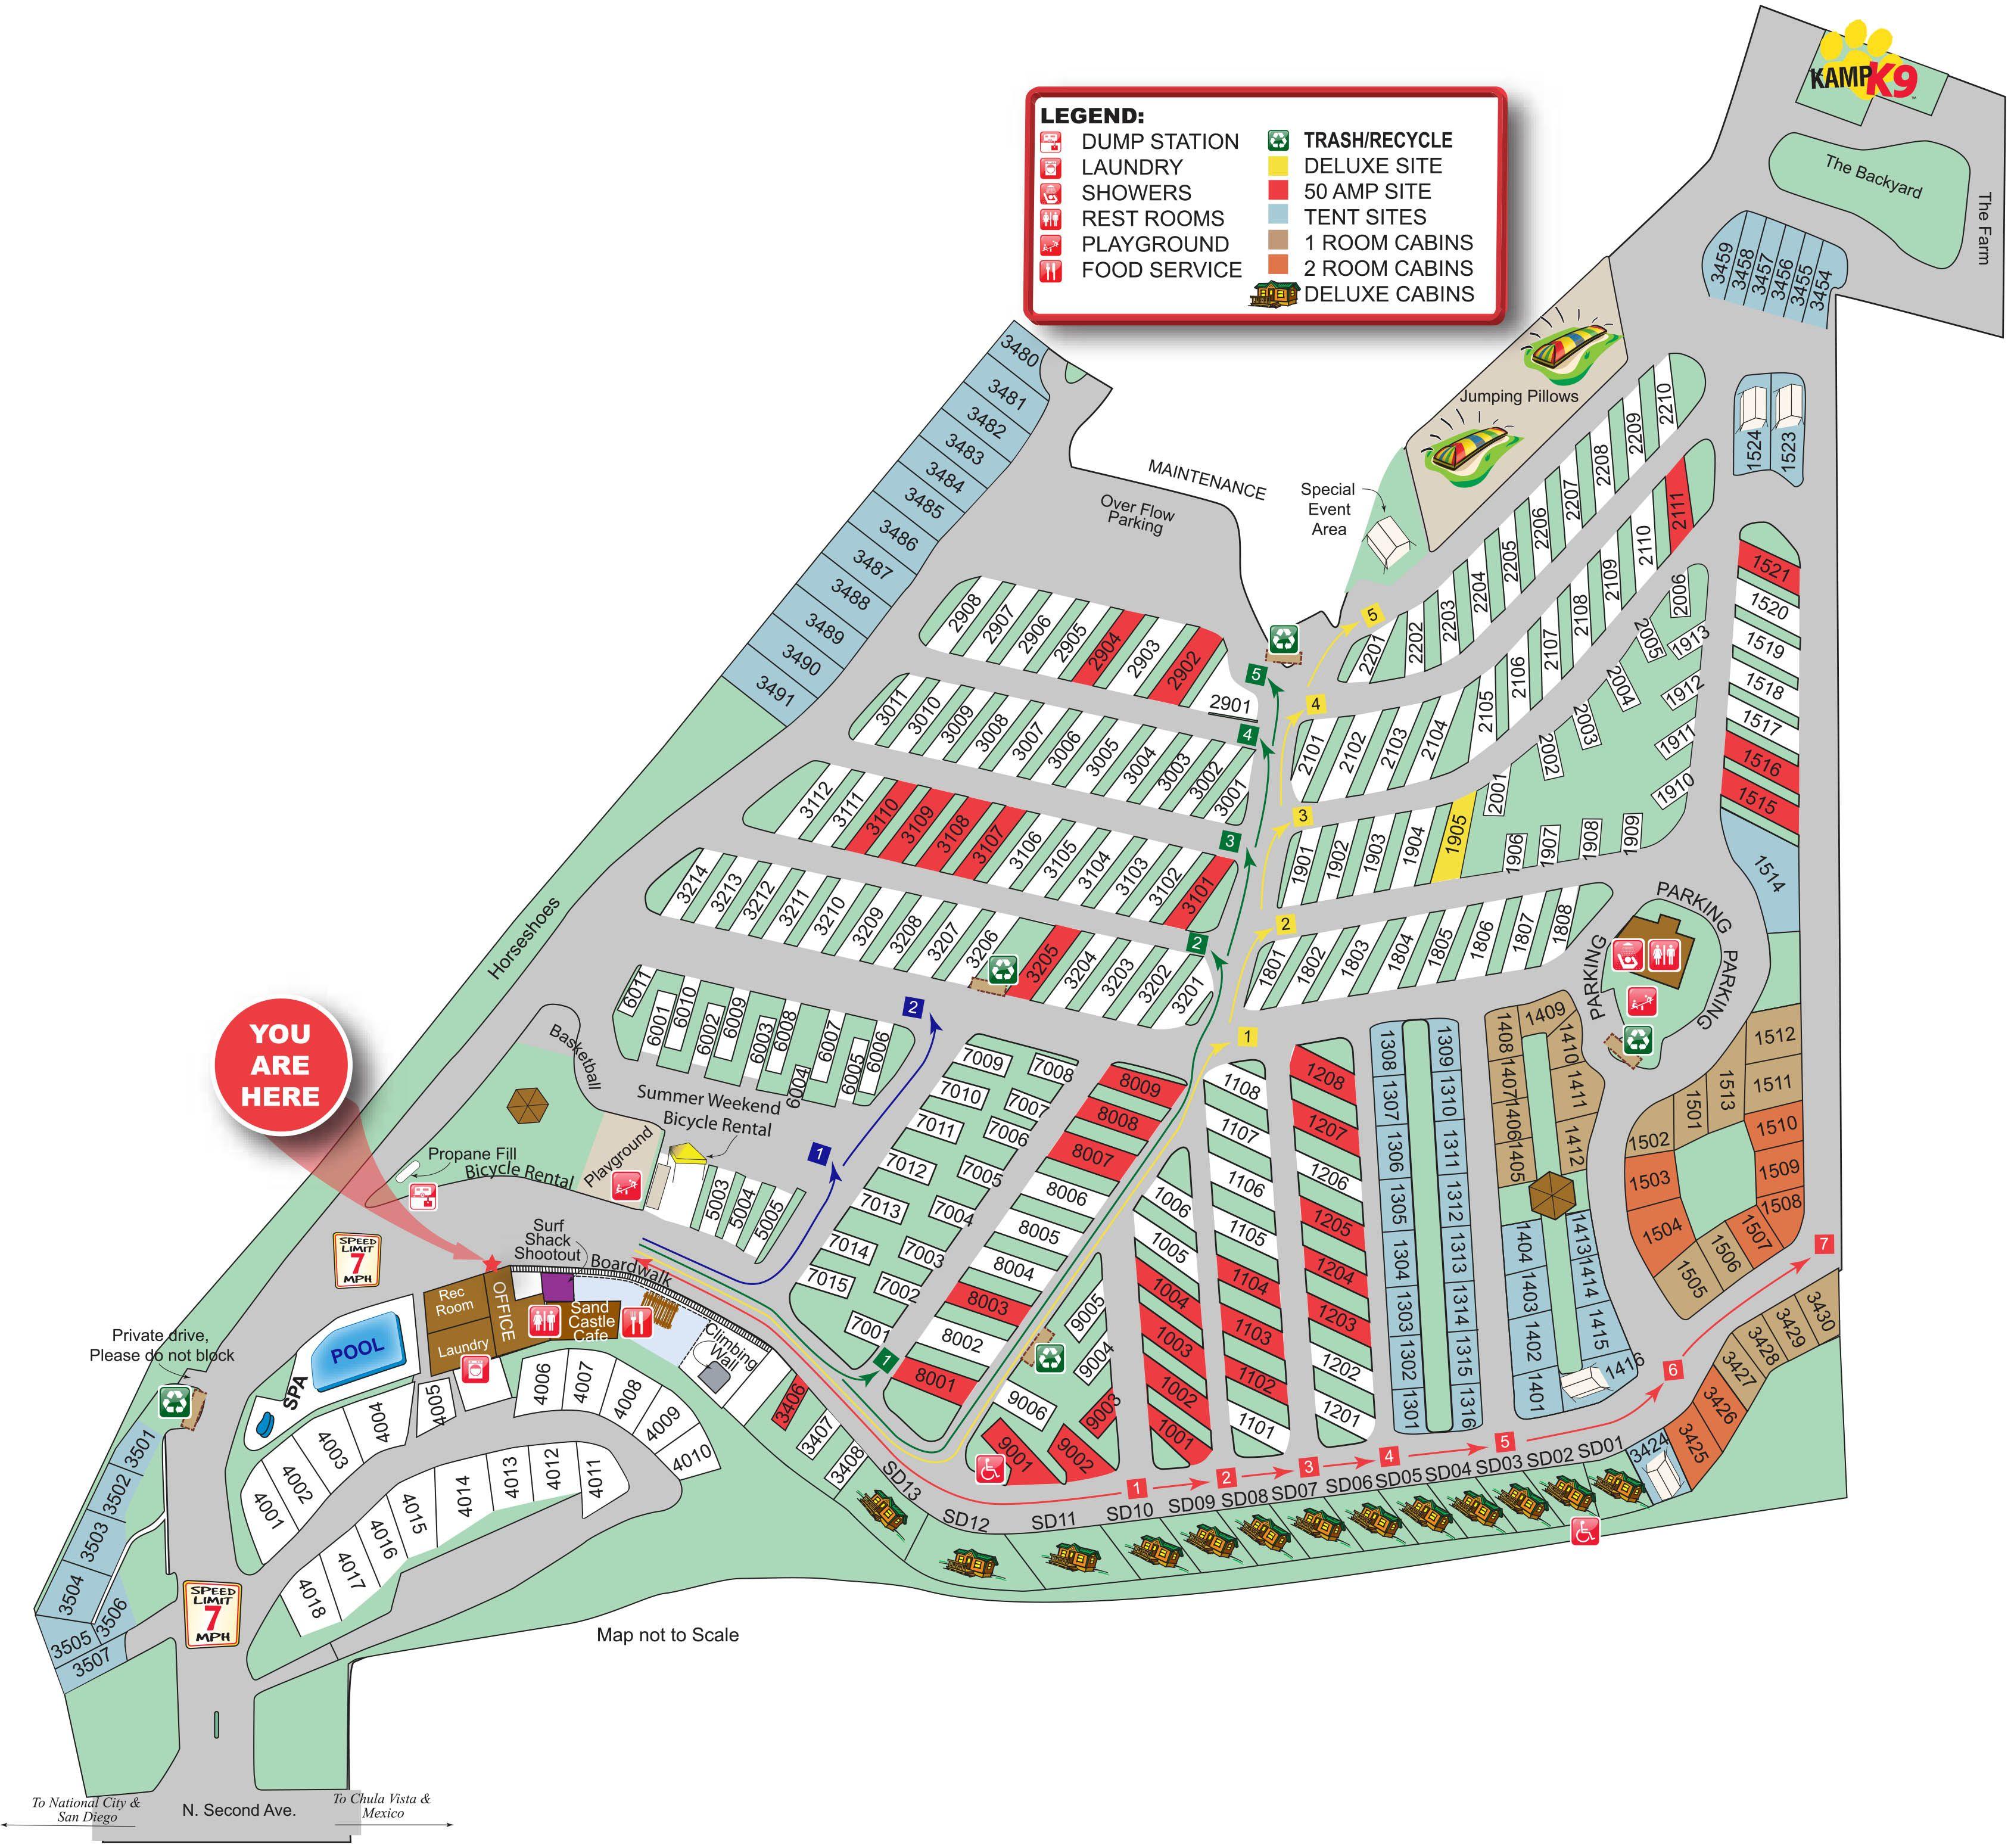 Chula Vista KOA Campground Site Map summertime Pinterest